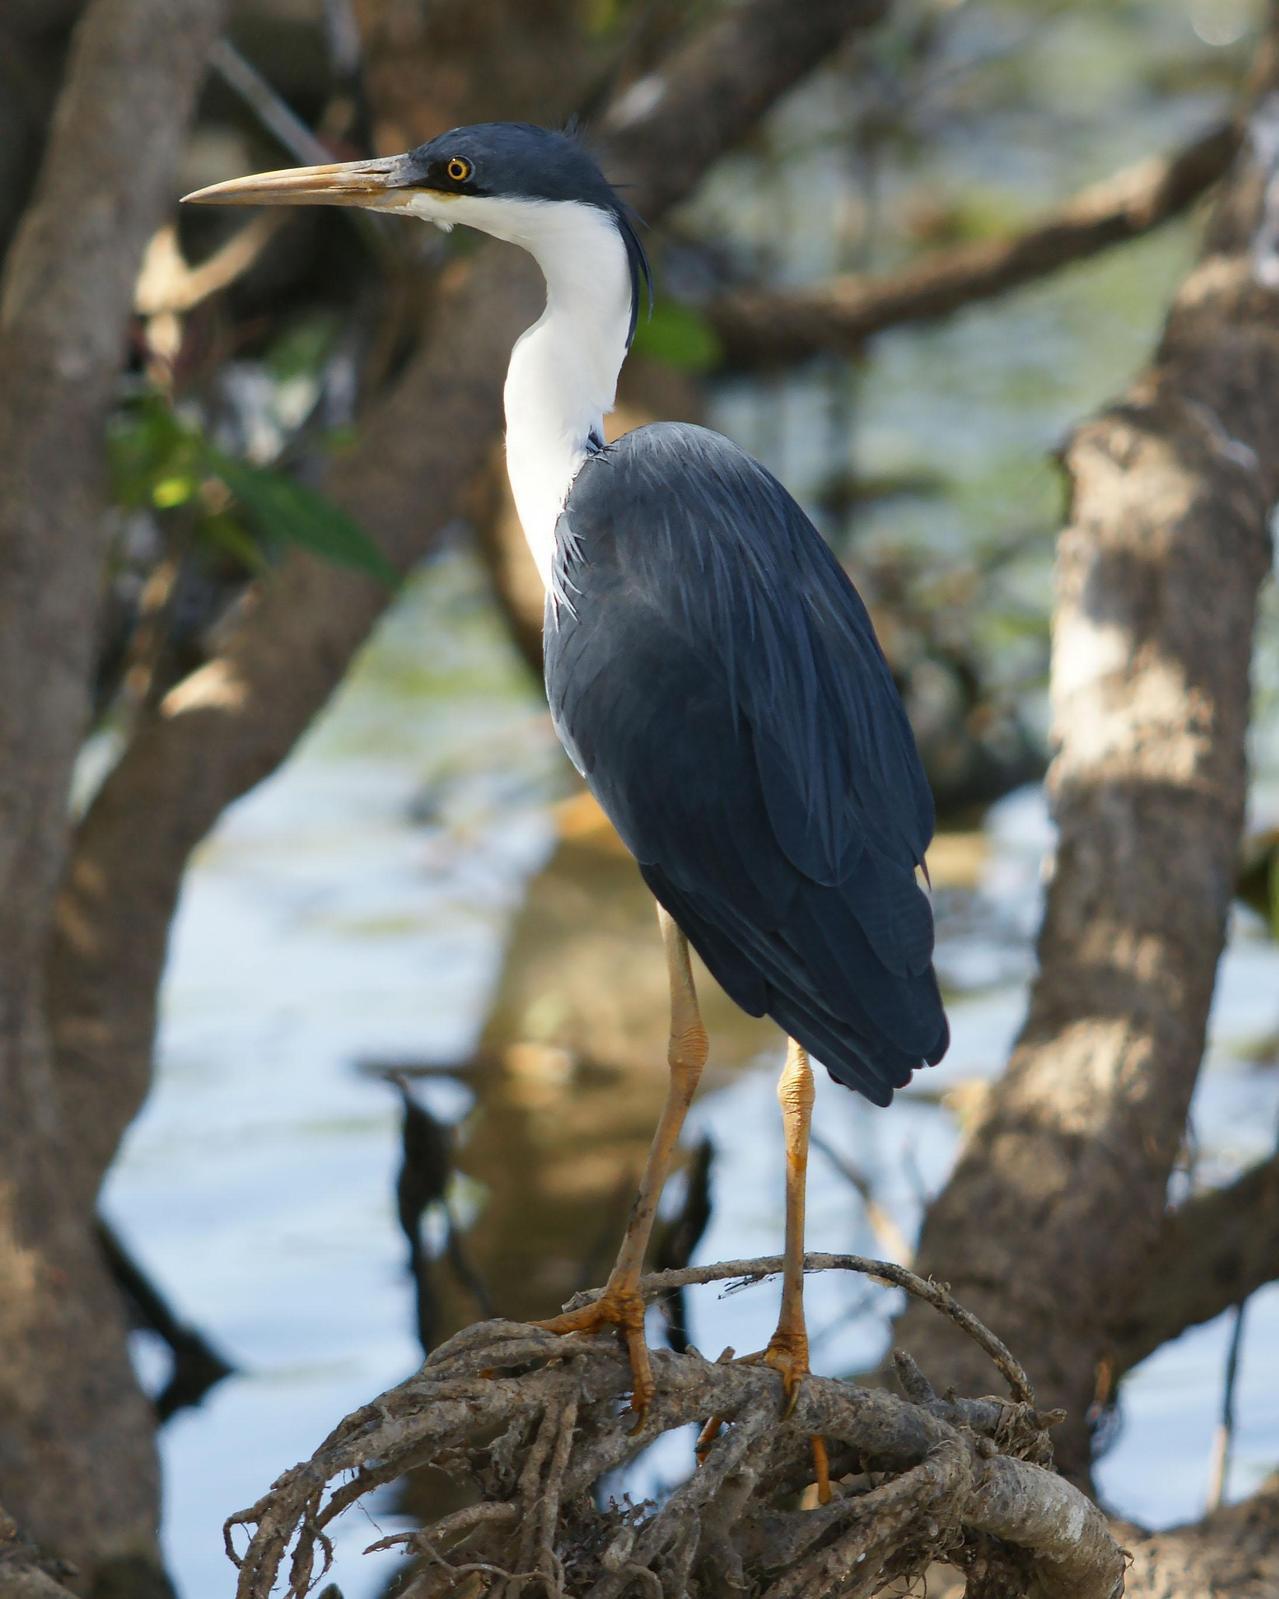 Pied Heron Photo by Steve Percival